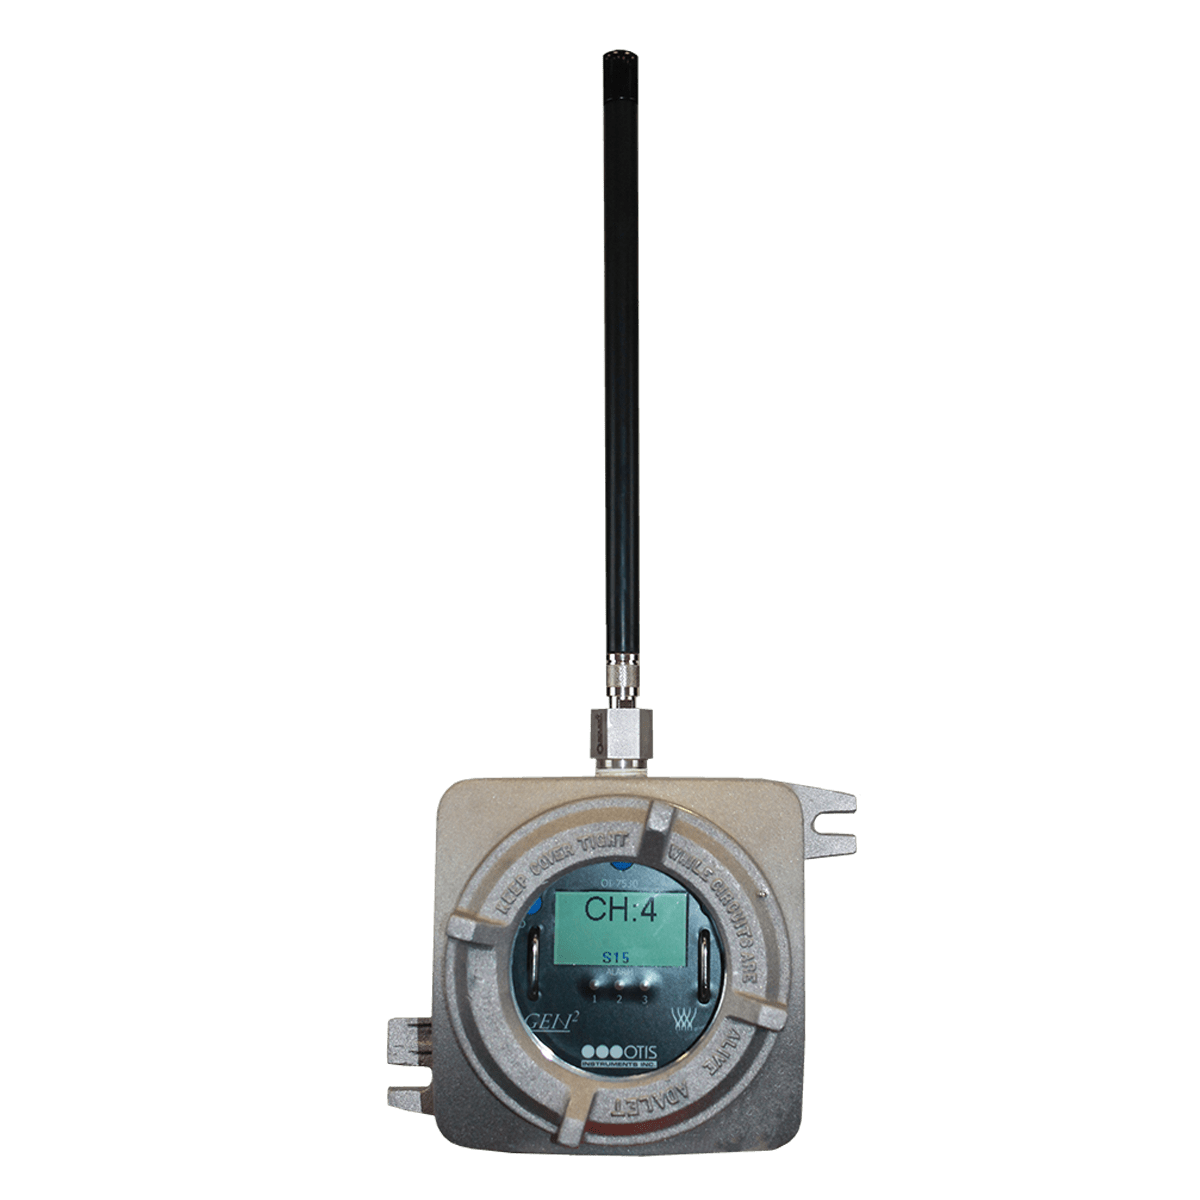 0I-7530 Controller - Otis Instruments (1)